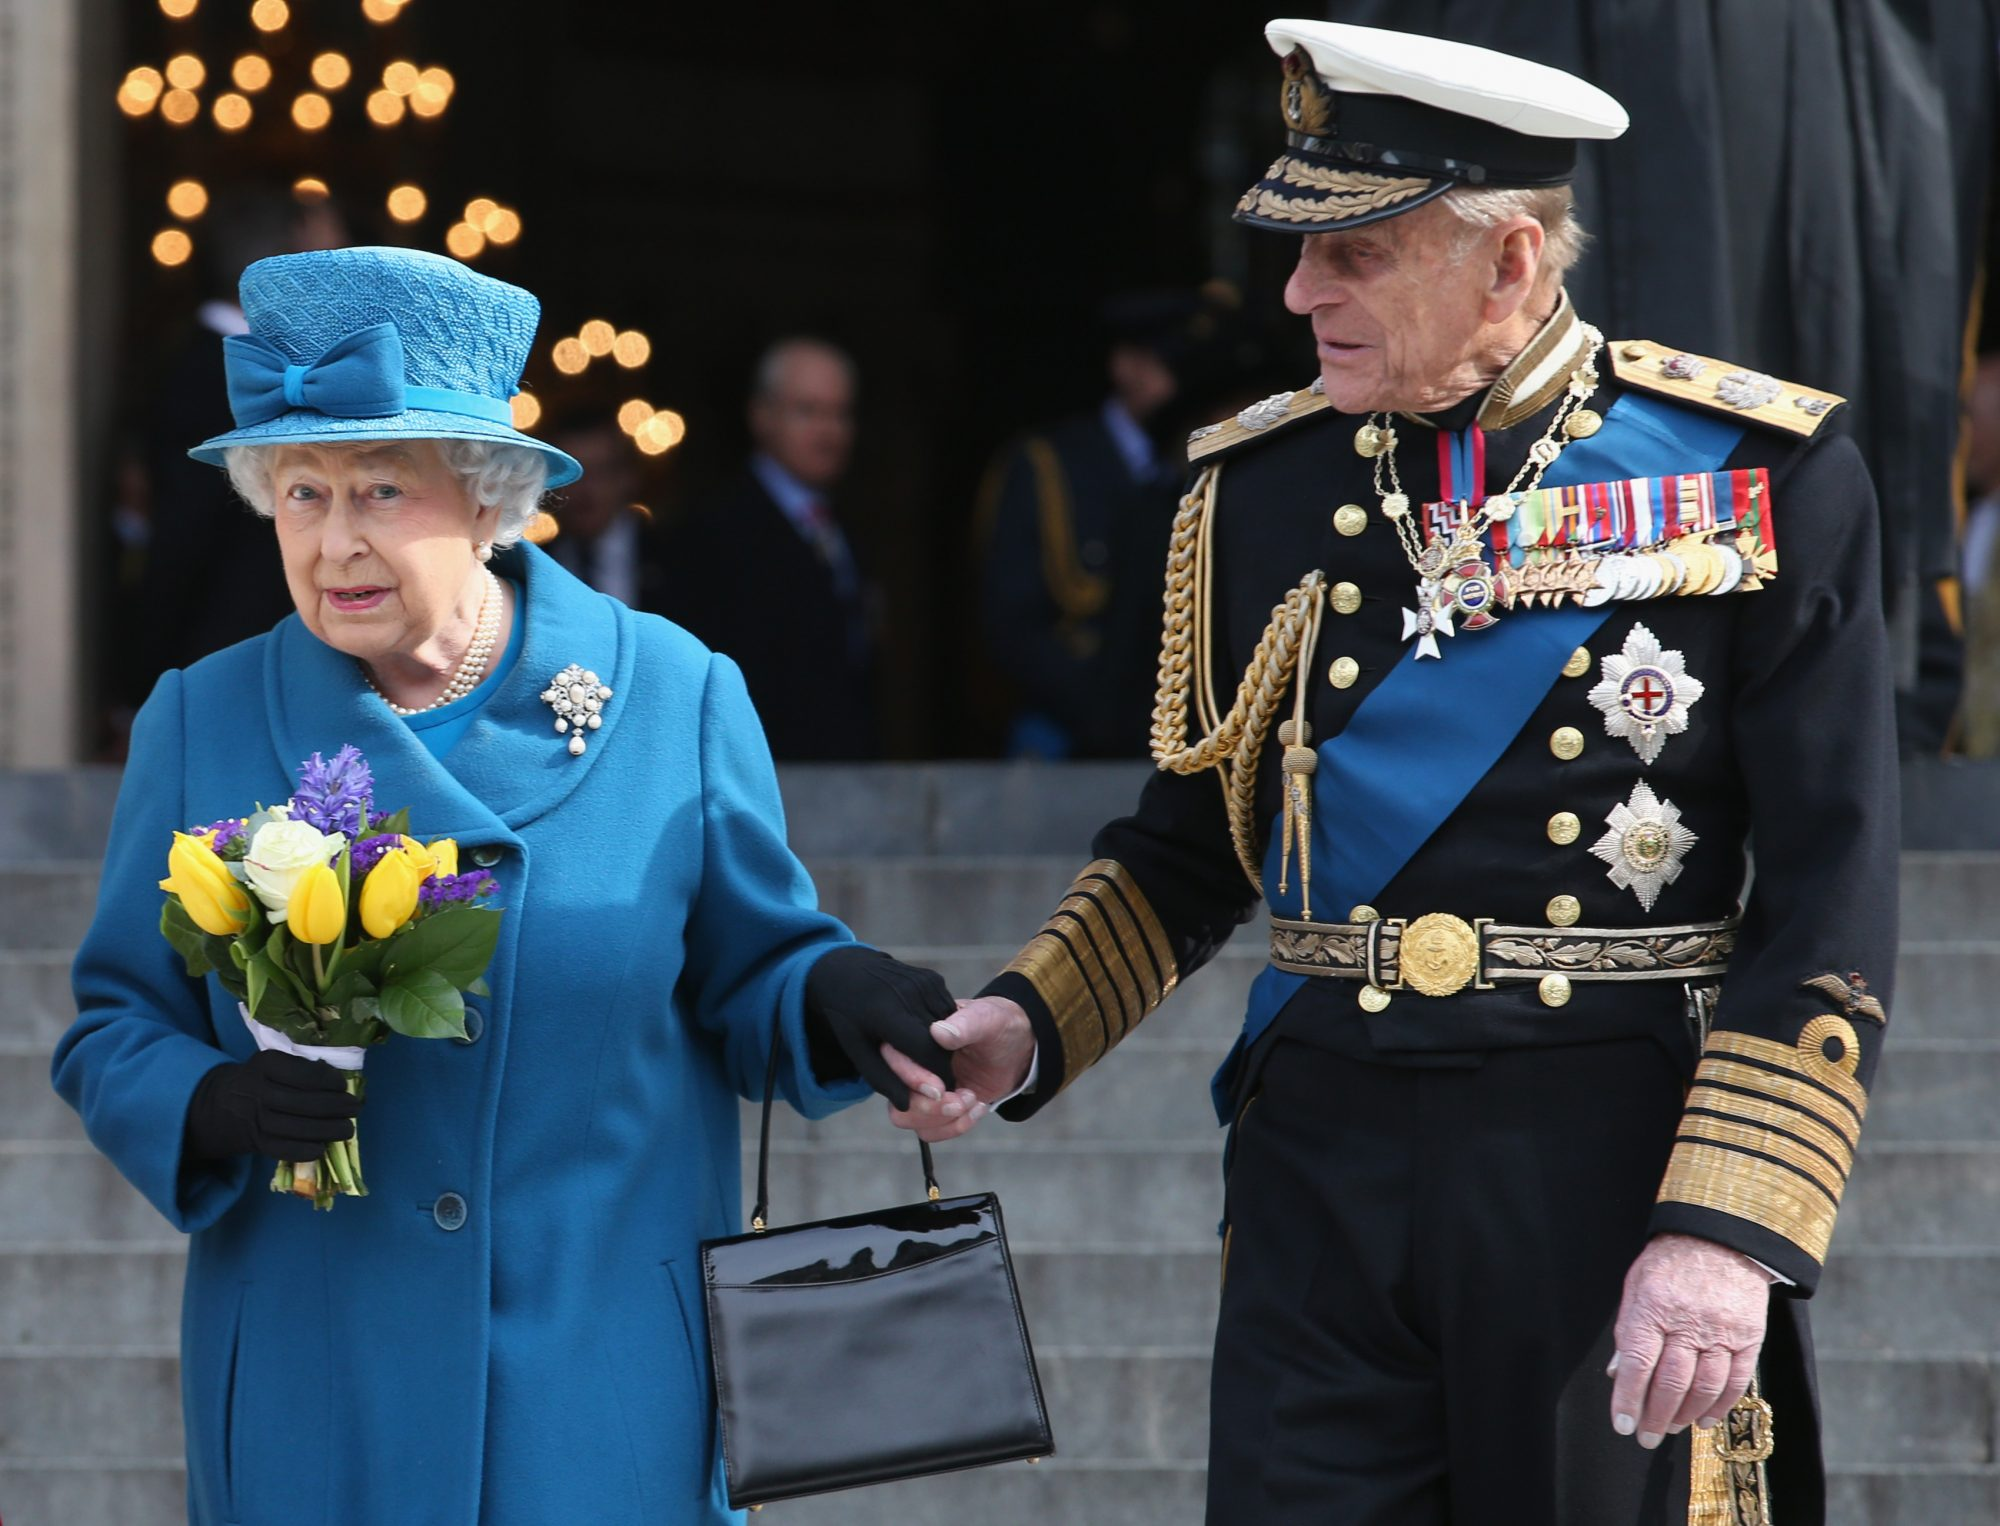 Principe Felipe Reina Isabel